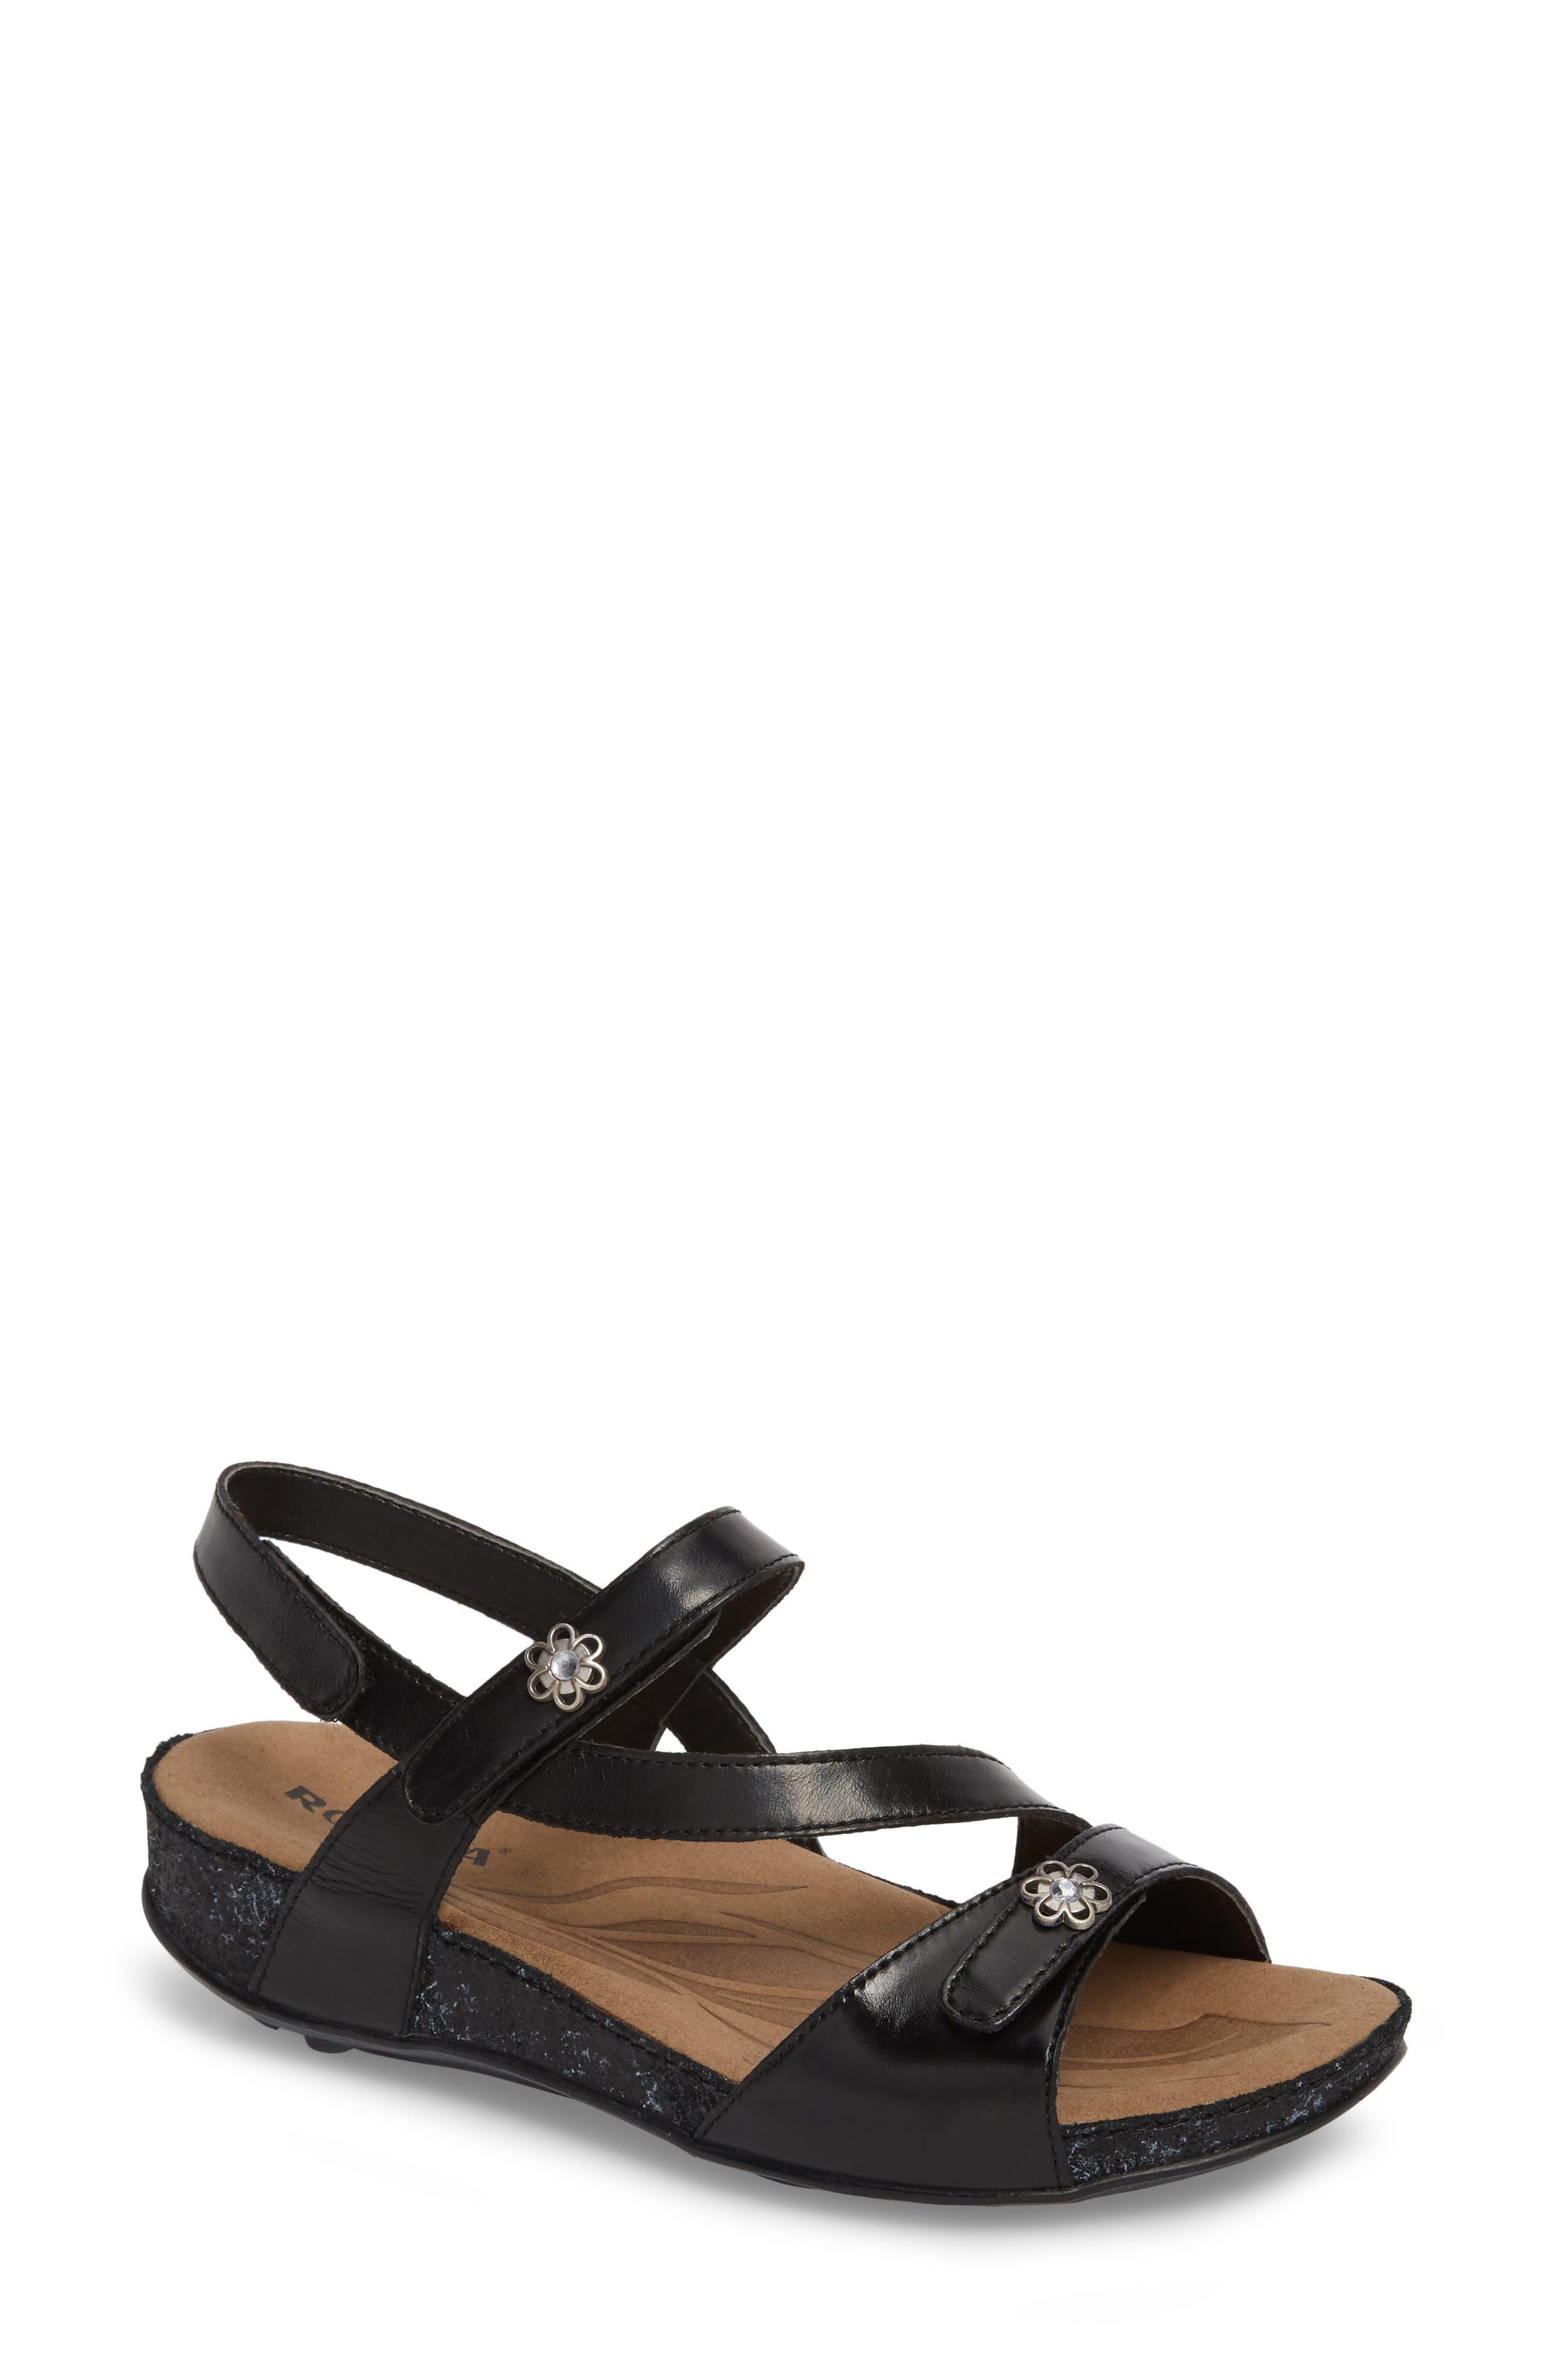 Fidschi 54 Sandal,                         Main,                         color, 003